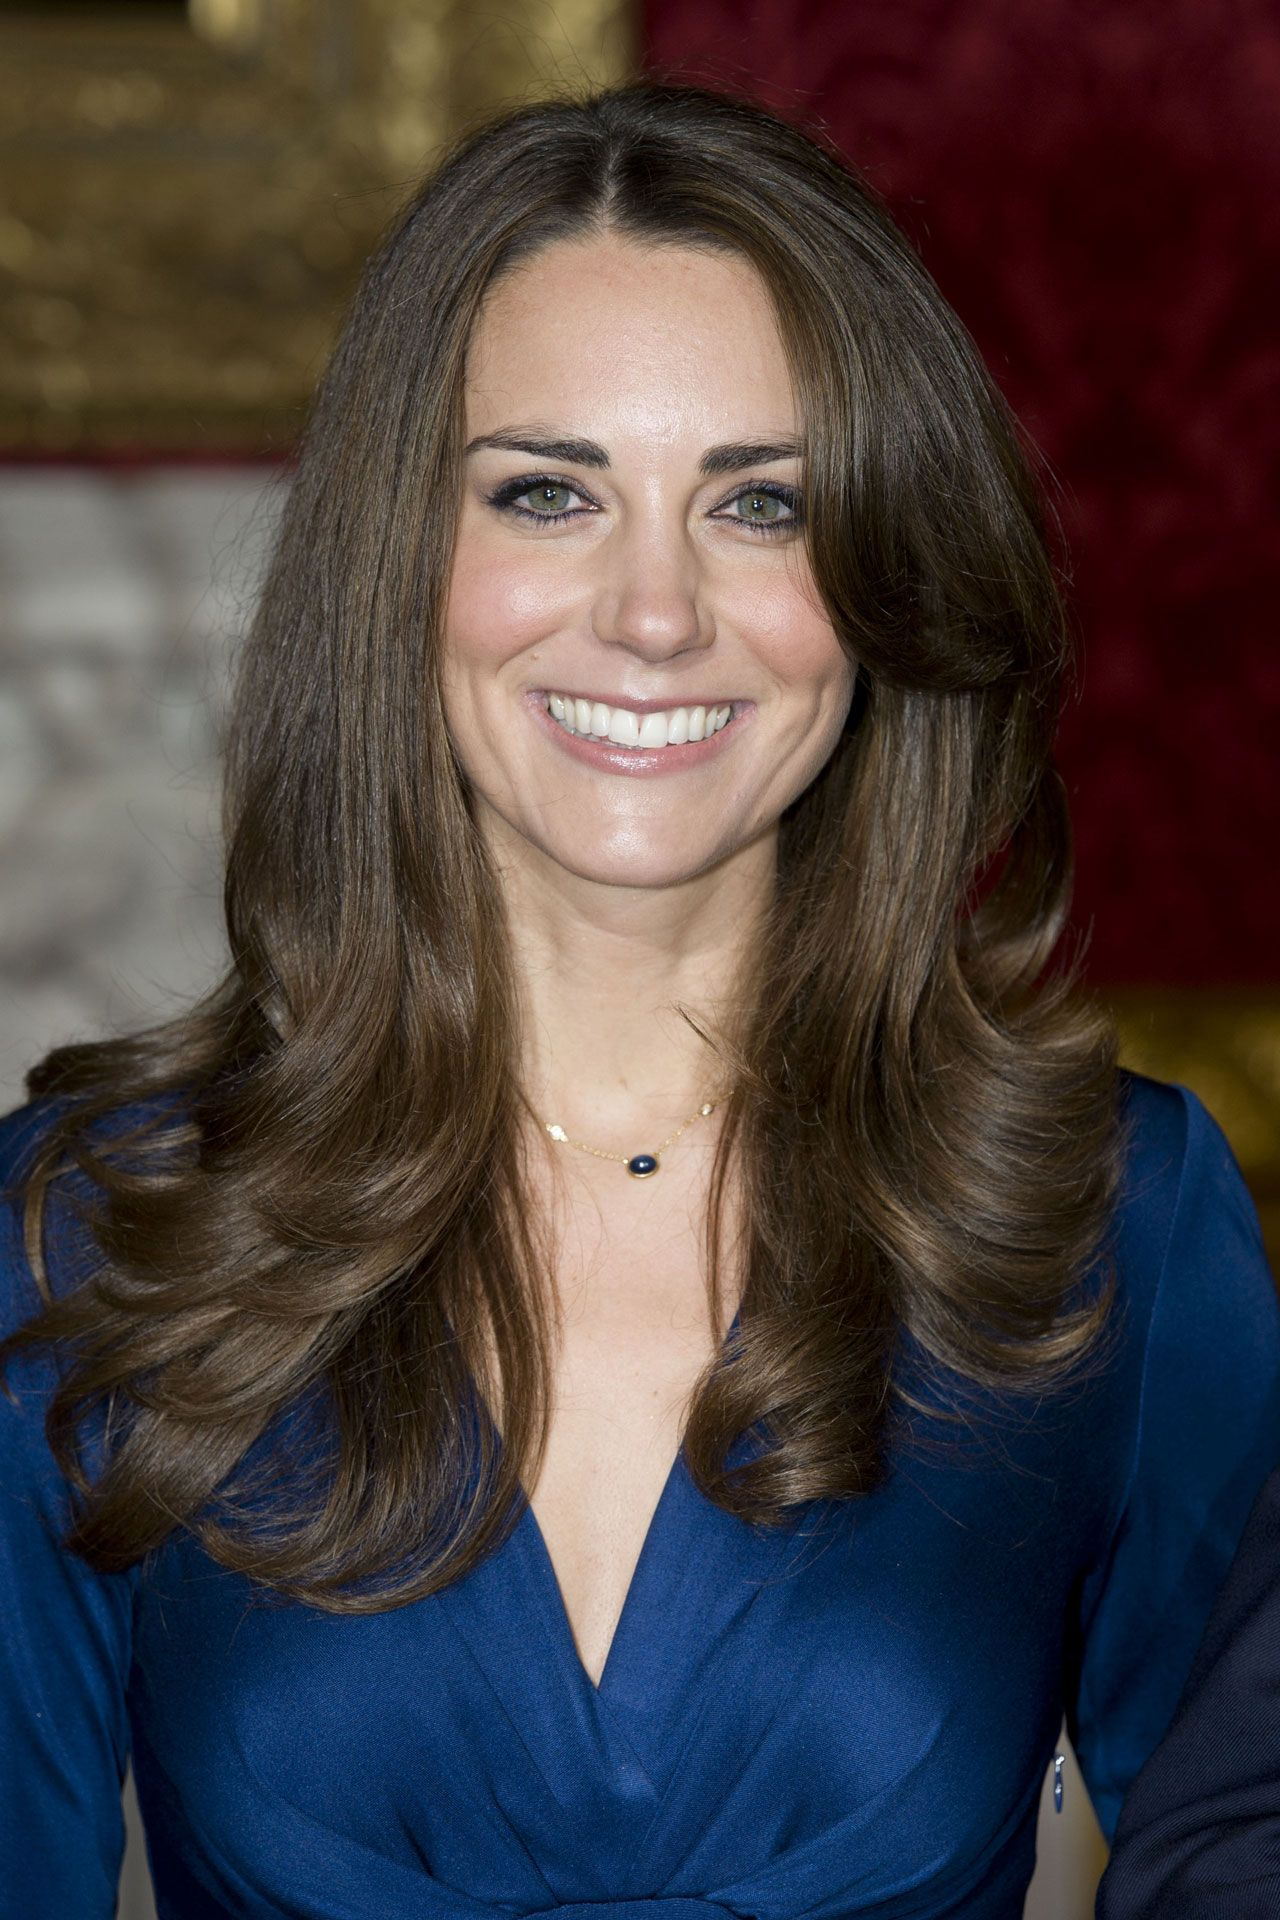 kate middleton hair & hairstyles - duchess of cambridge (vogue